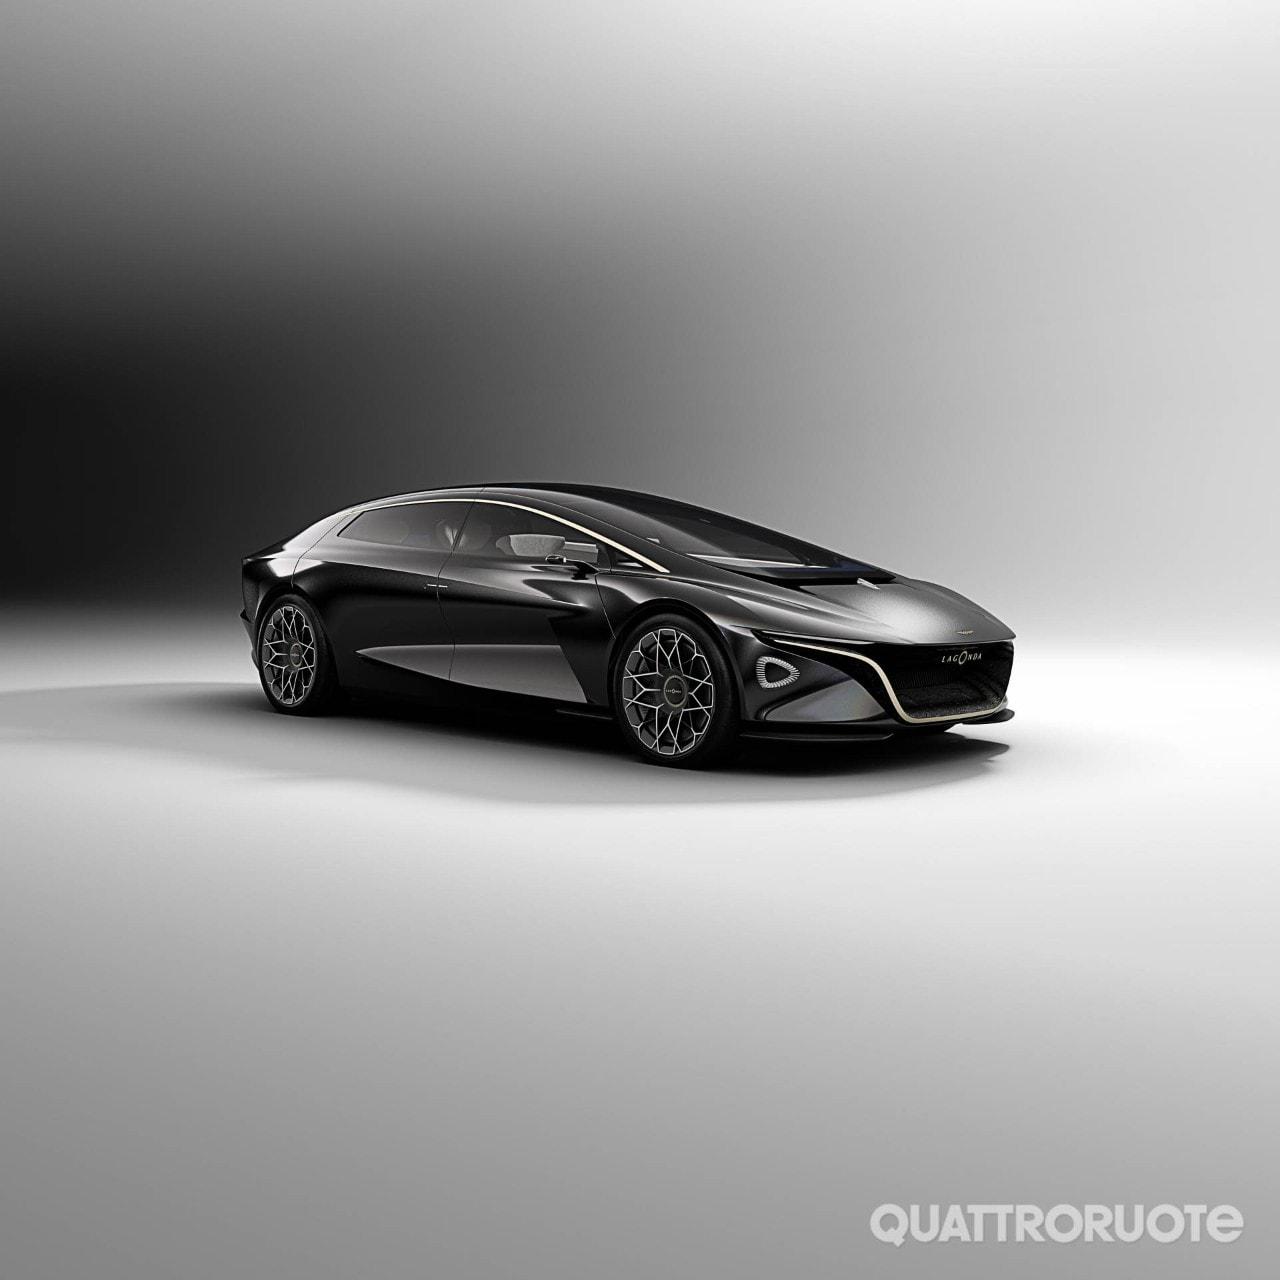 2018-Aston-Lagonda-Vision-Concept-1.jpg